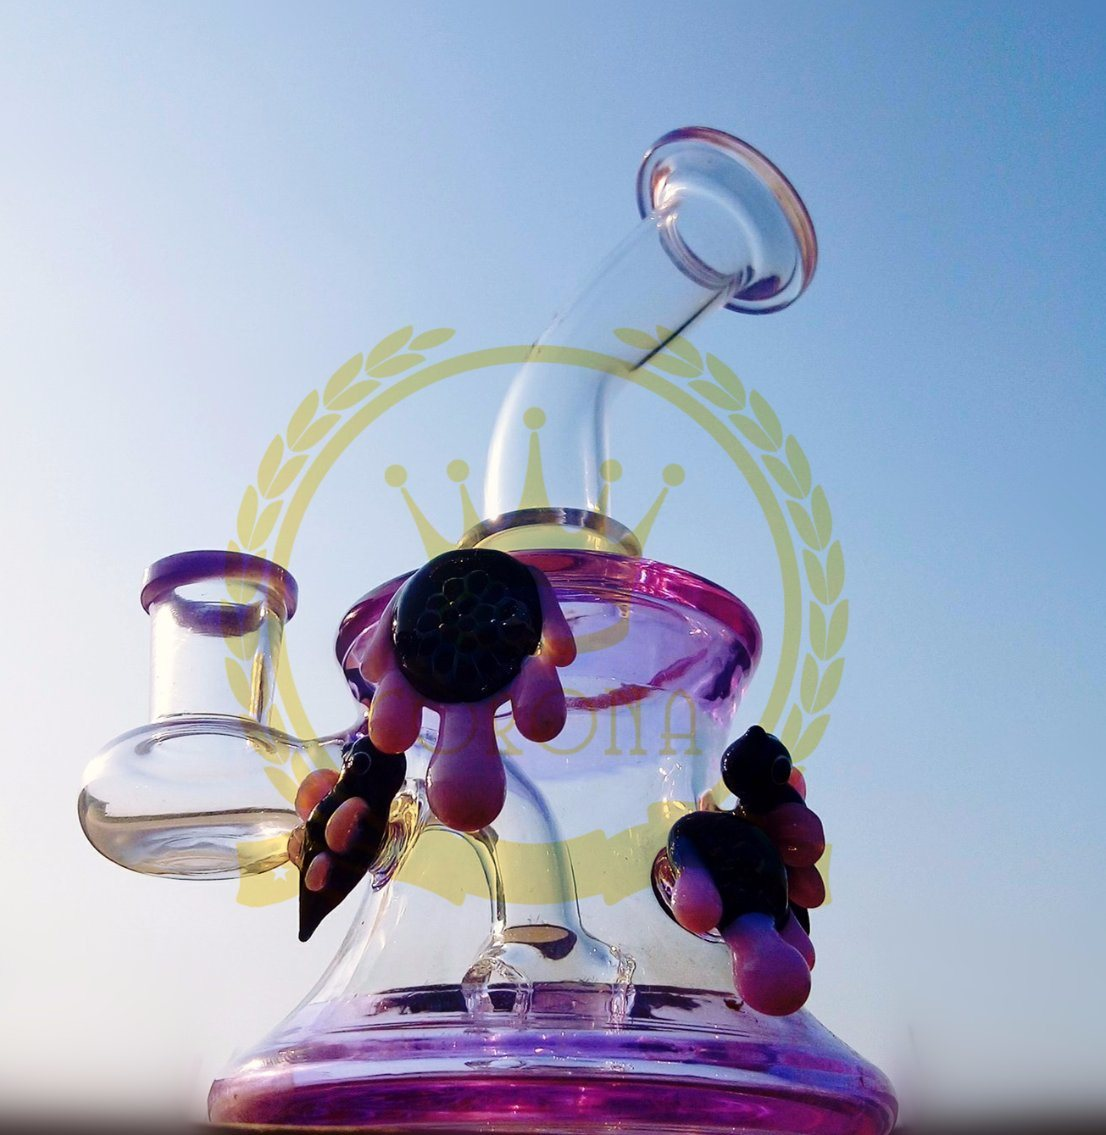 Corona Bubbler Smoking Glass Water Pipe Hookah Hand Blown Heady Tobacco Bubbler Wholesale